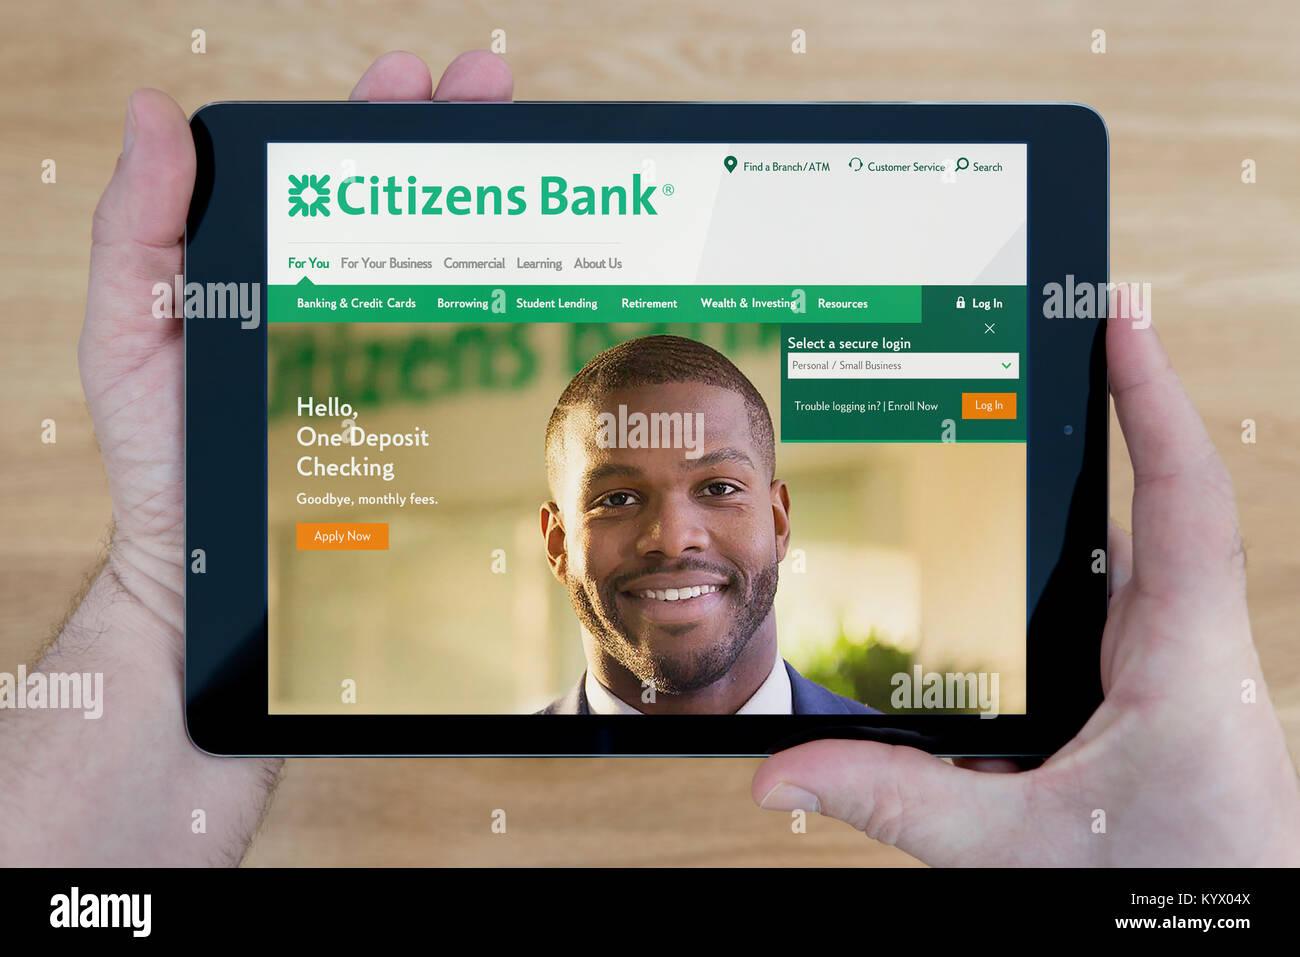 Citizens Bank Not Park Stock Photos & Citizens Bank Not Park Stock ...